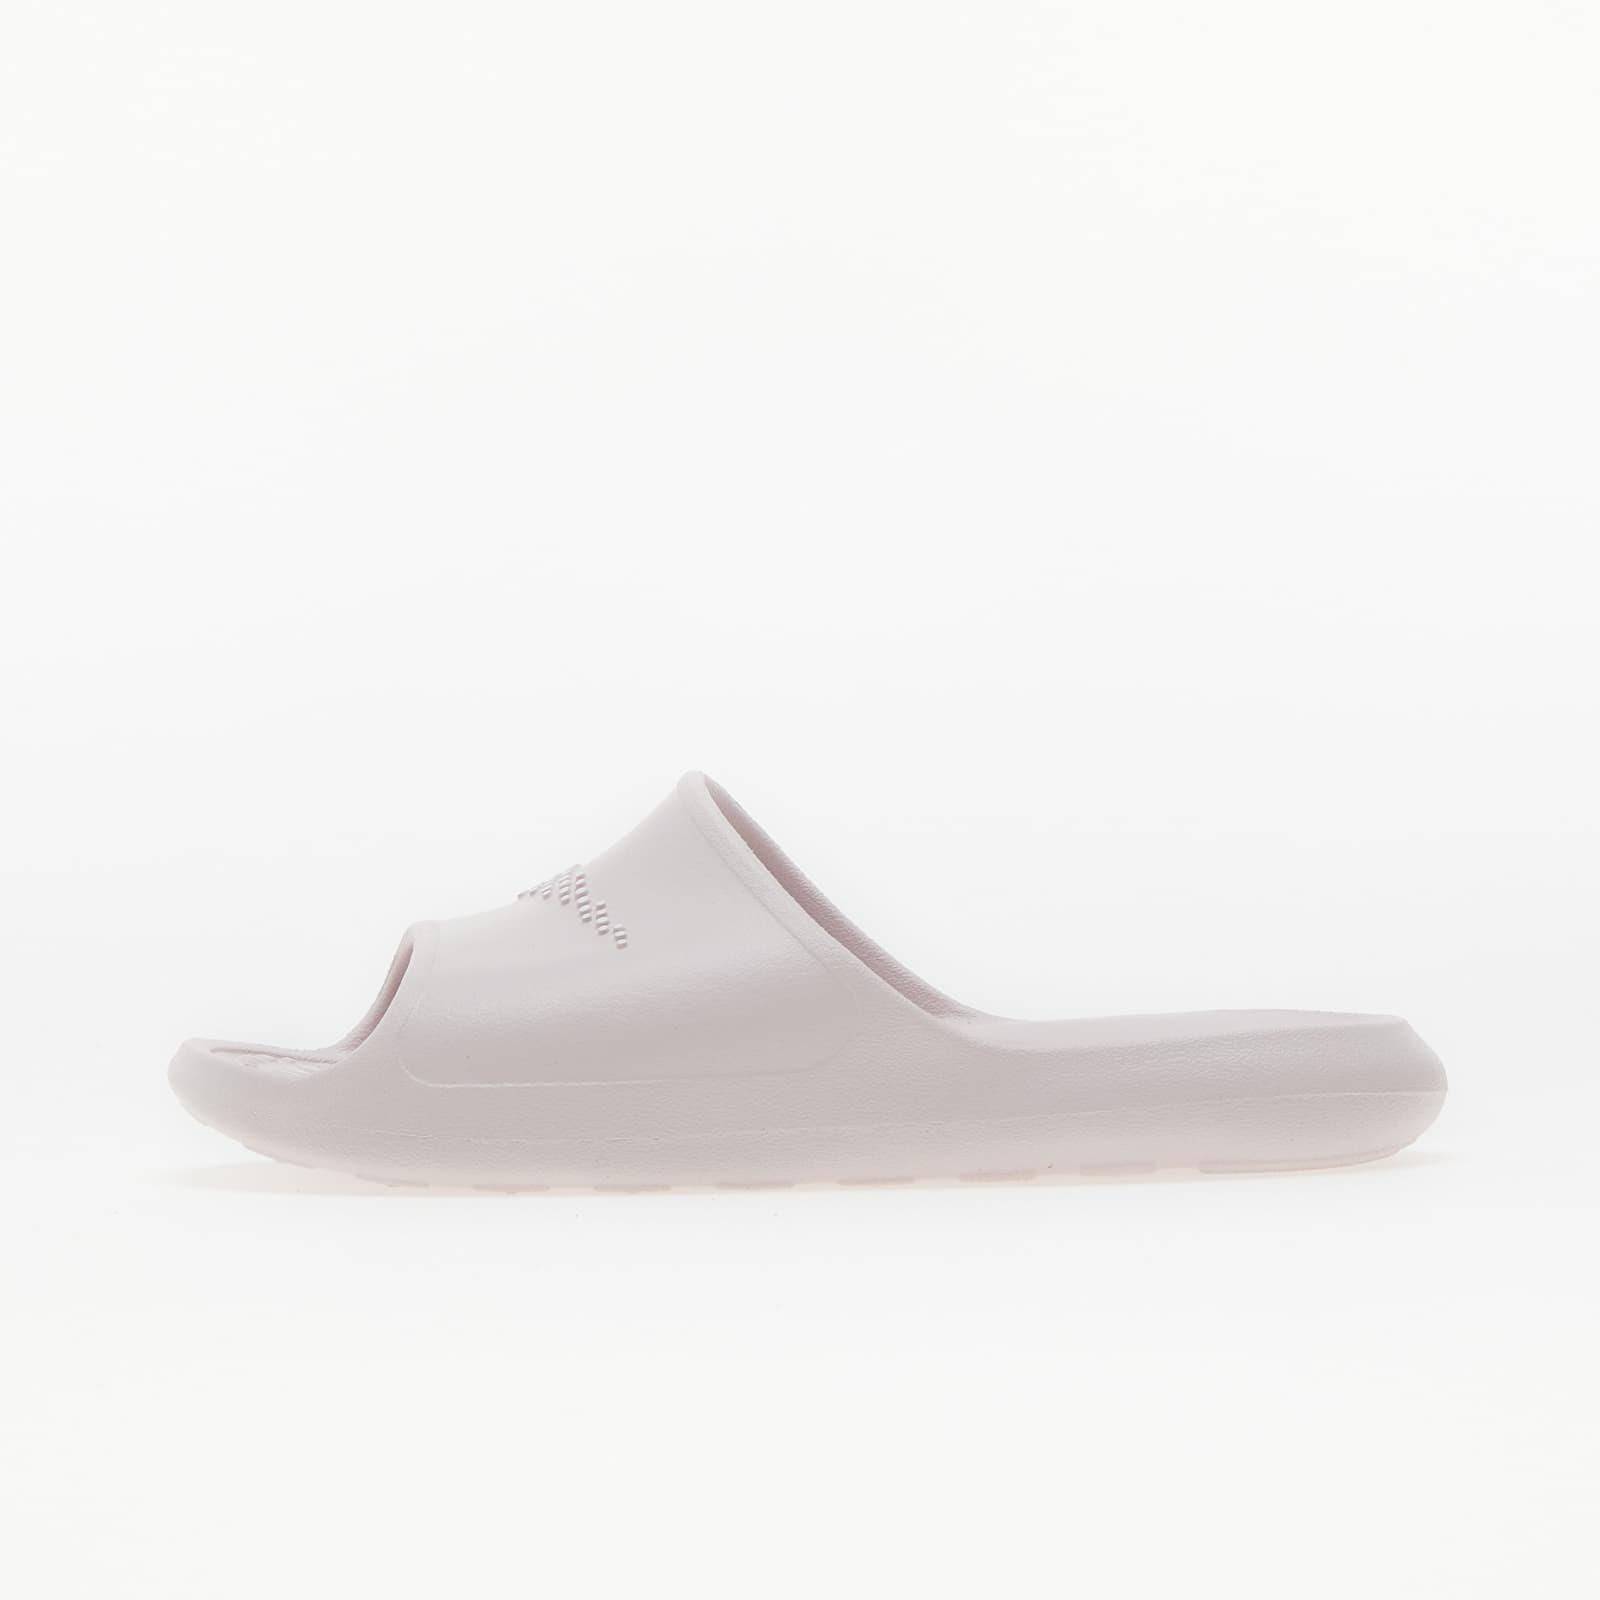 Nike W Victori One Shower Slide Barely Rose/ White-Barely Rose EUR 40.5